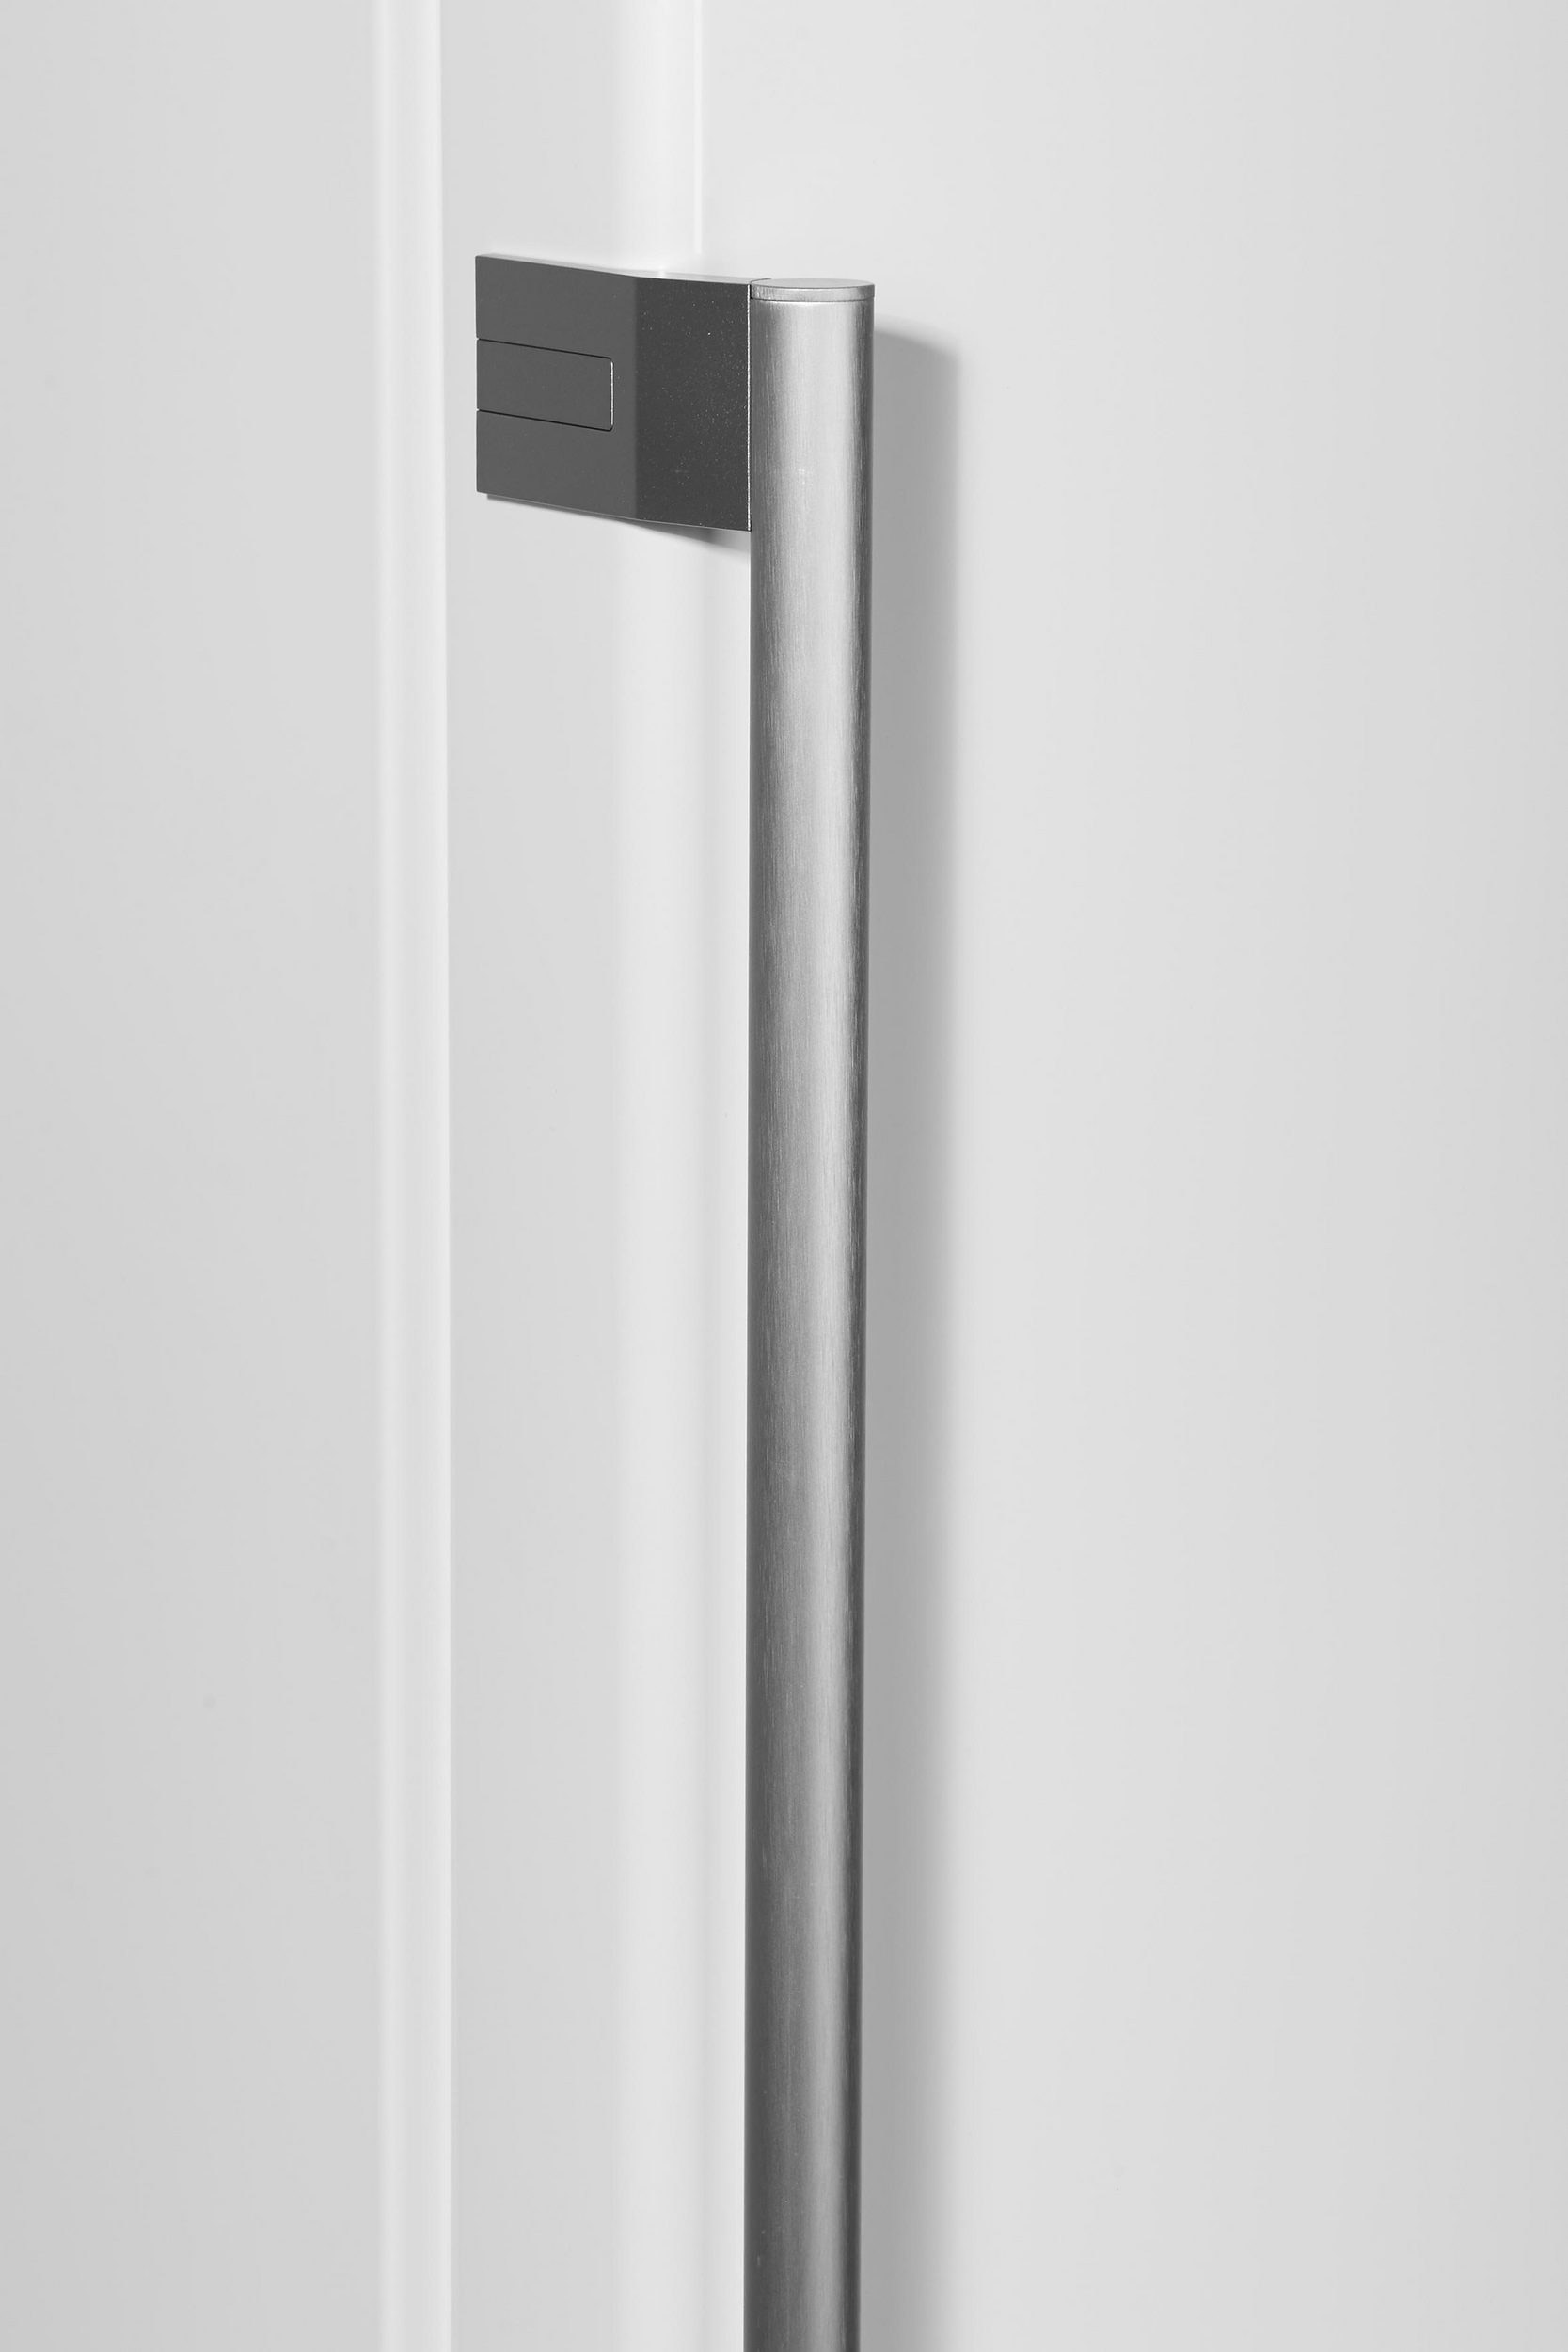 bauknecht gkn 272 a3 fagyaszt szekr ny grx electro outlet. Black Bedroom Furniture Sets. Home Design Ideas